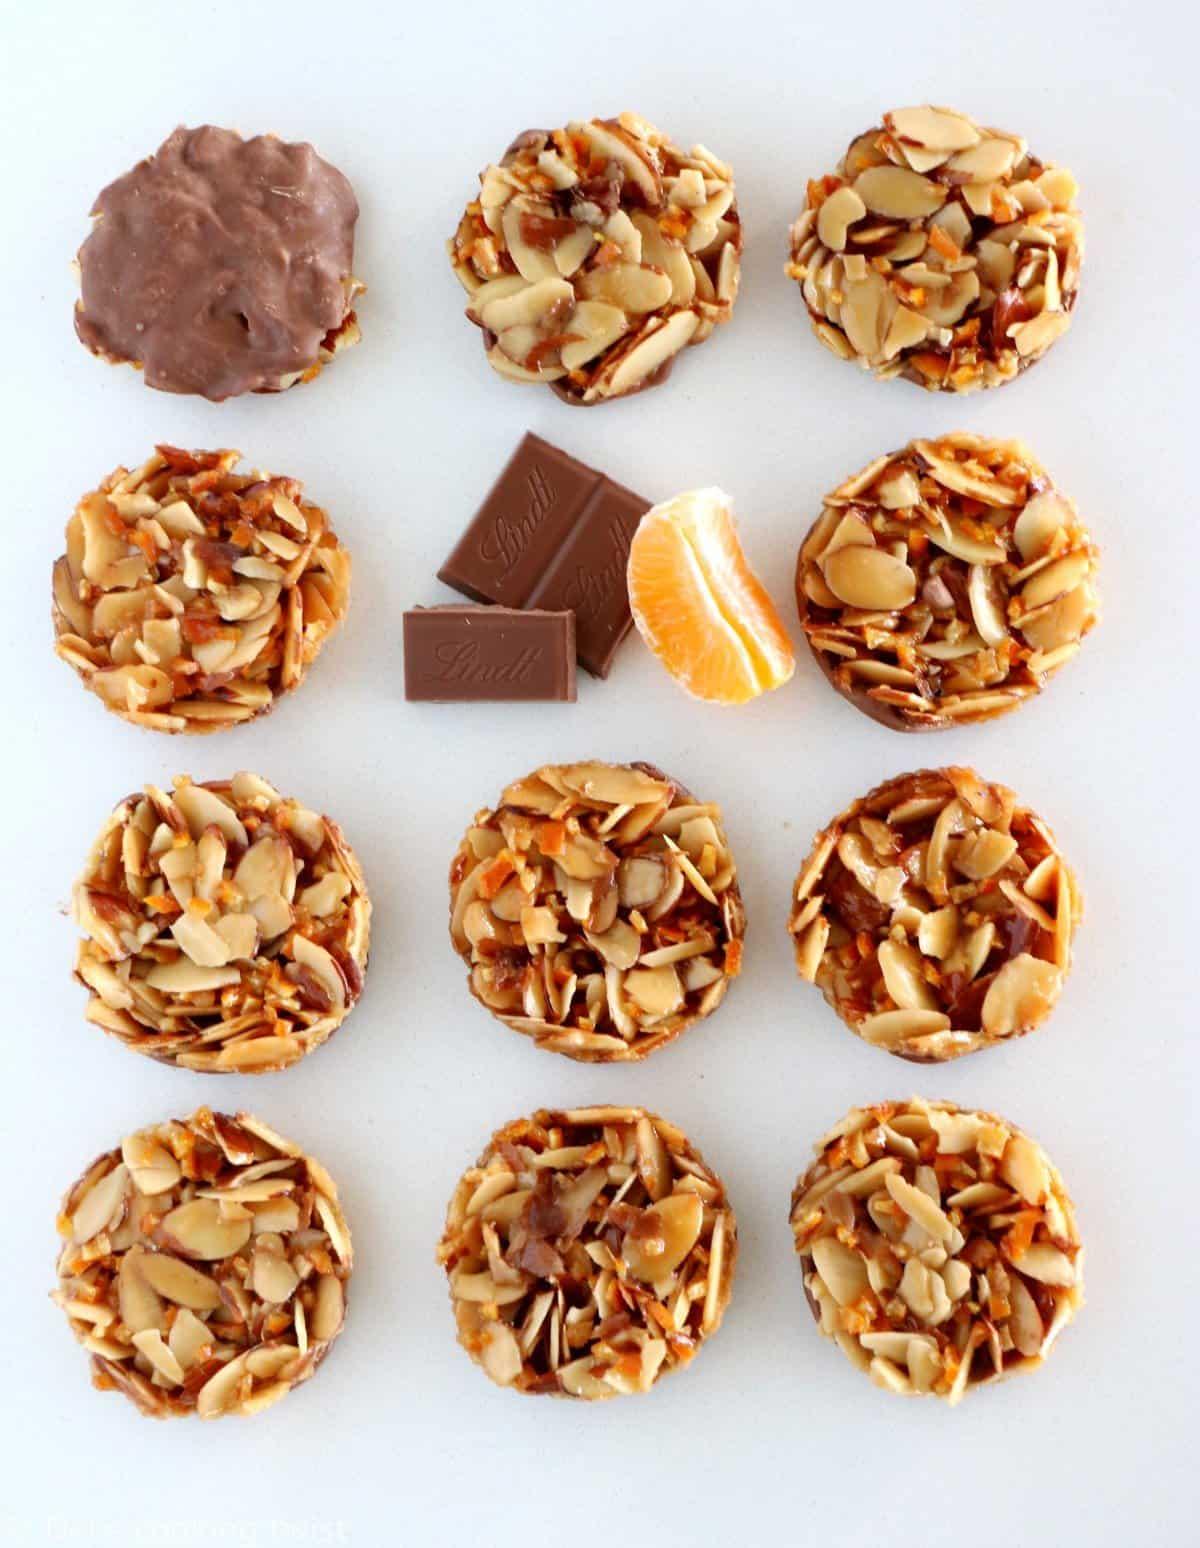 Chocolate Florentines